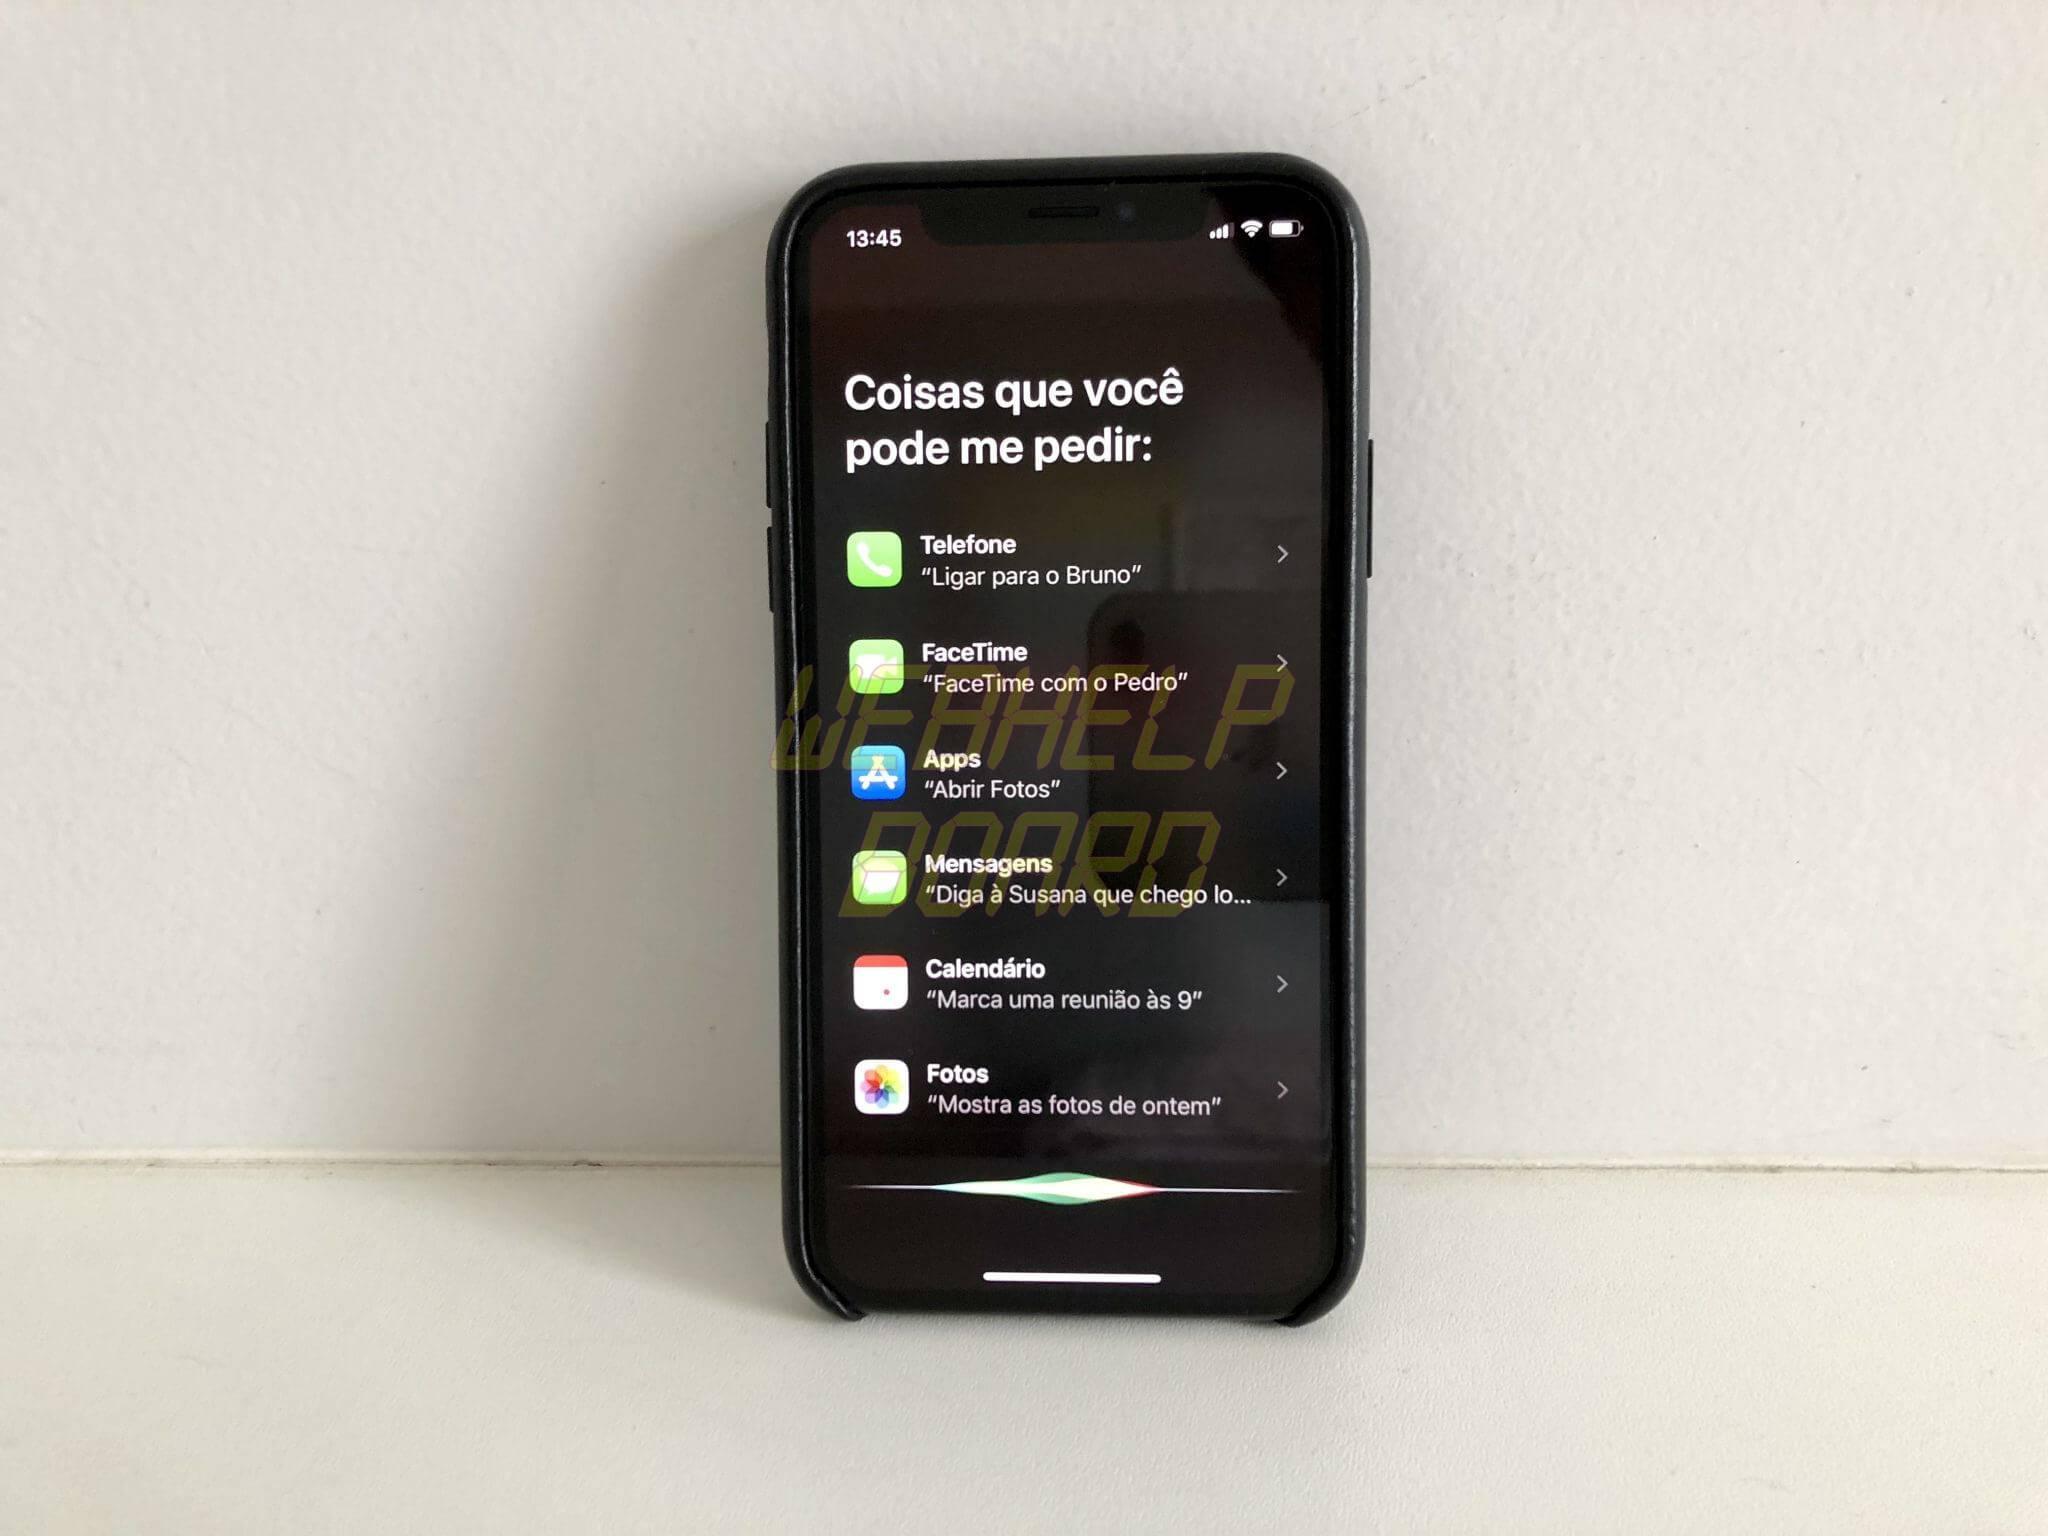 454C4F0C 3093 44C9 B38E B977419FC19A - Tutorial: Como funcionam os gestos no iPhone X